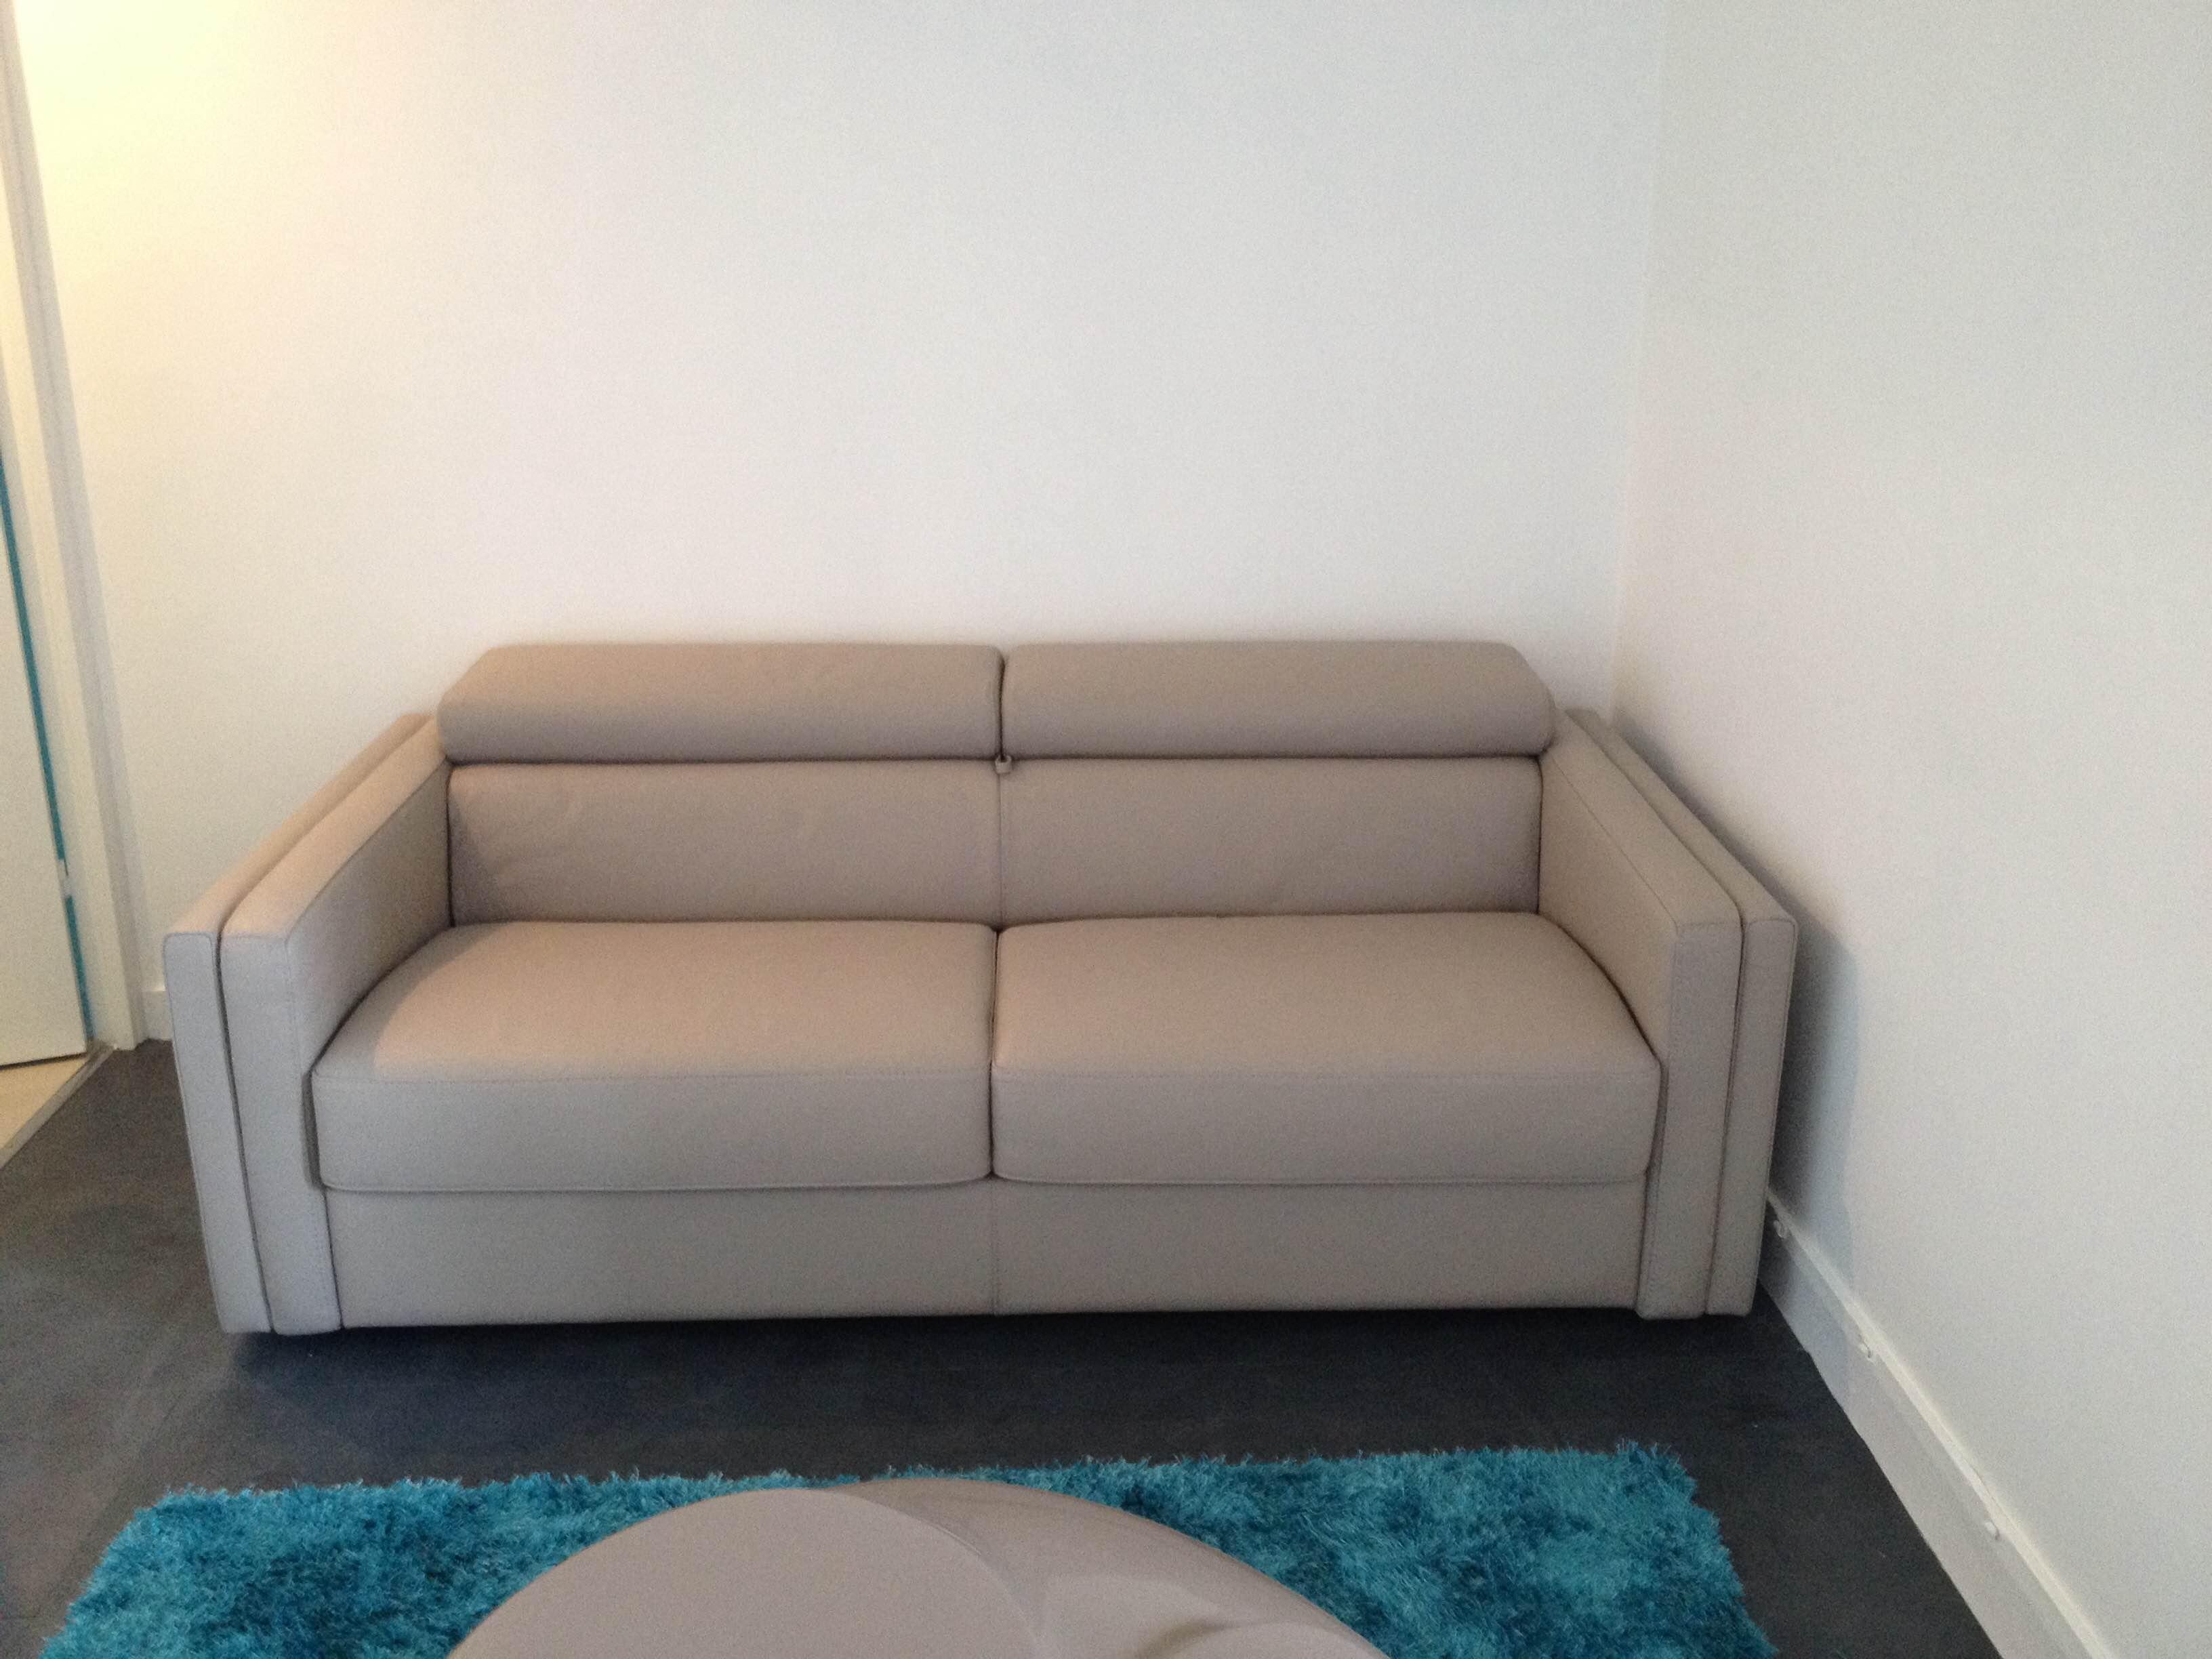 canap lit rochebobois meubles - Canape Convertible Roche Bobois